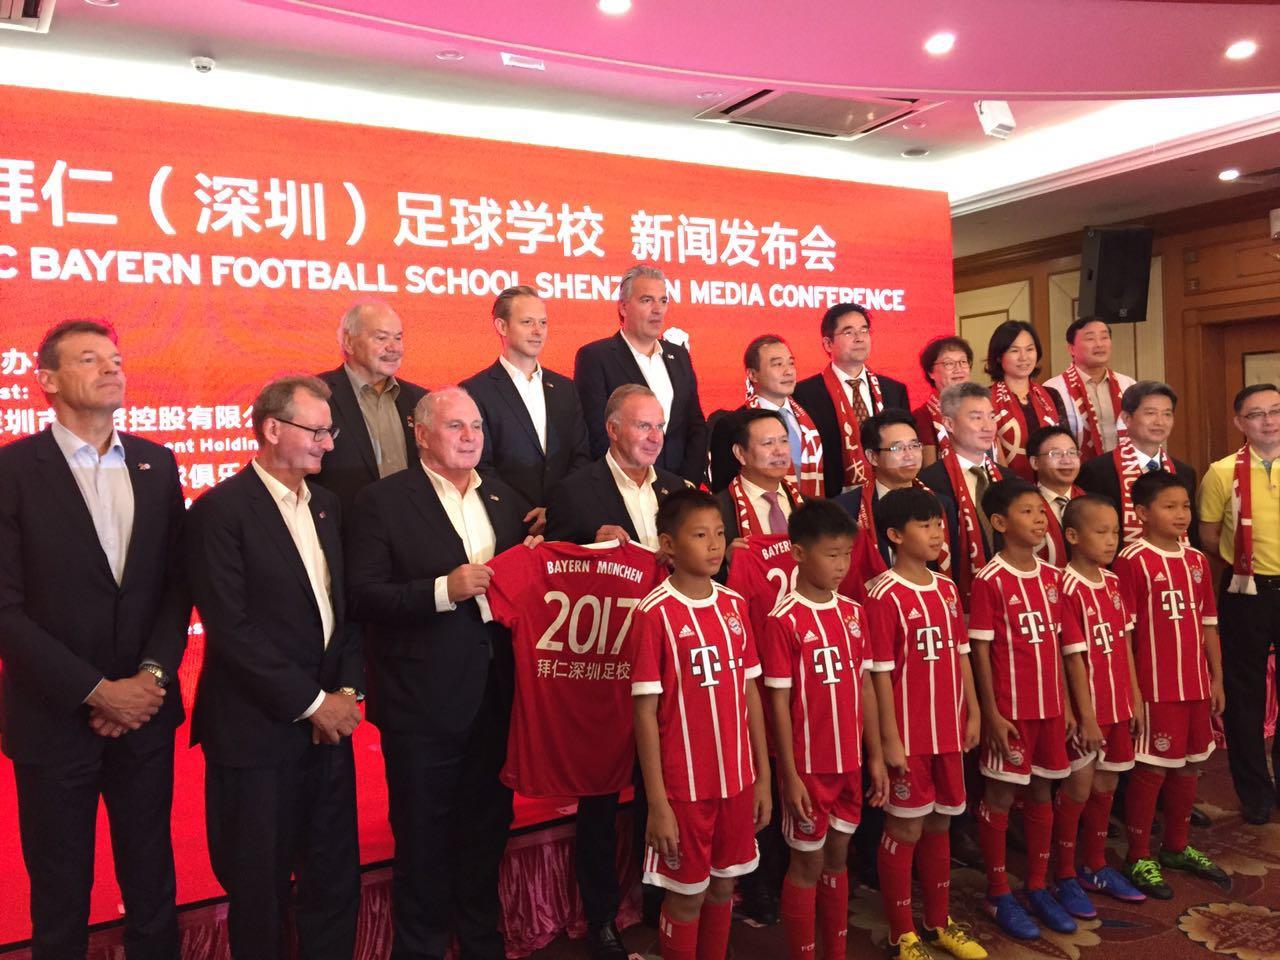 Bayern launch Shenzen football school